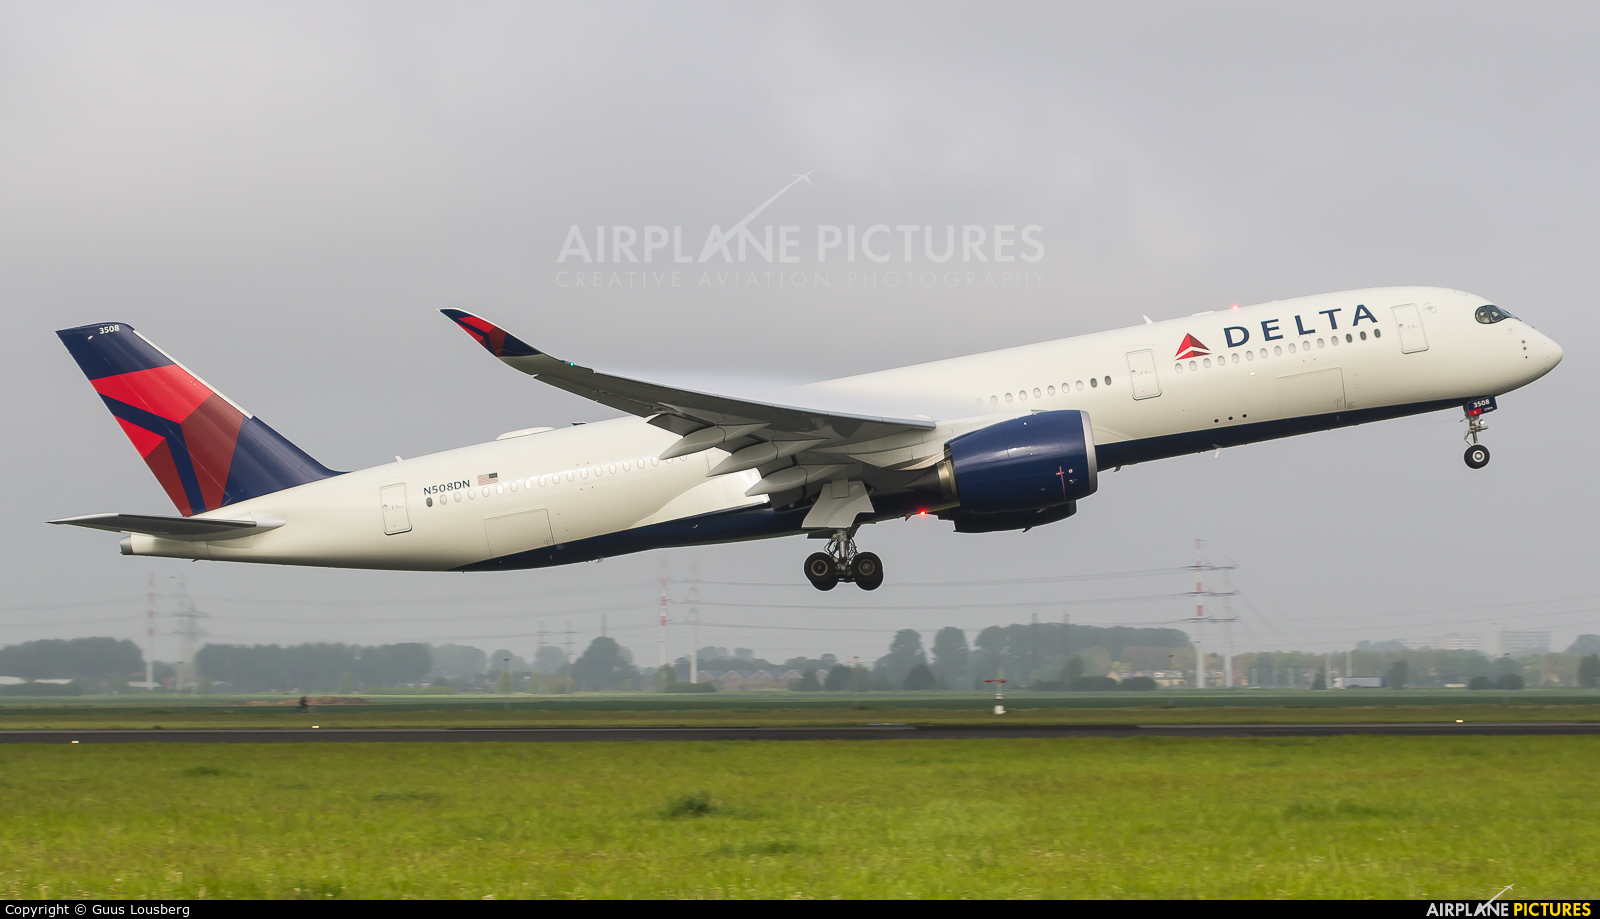 Delta Air Lines N508DN aircraft at Amsterdam - Schiphol